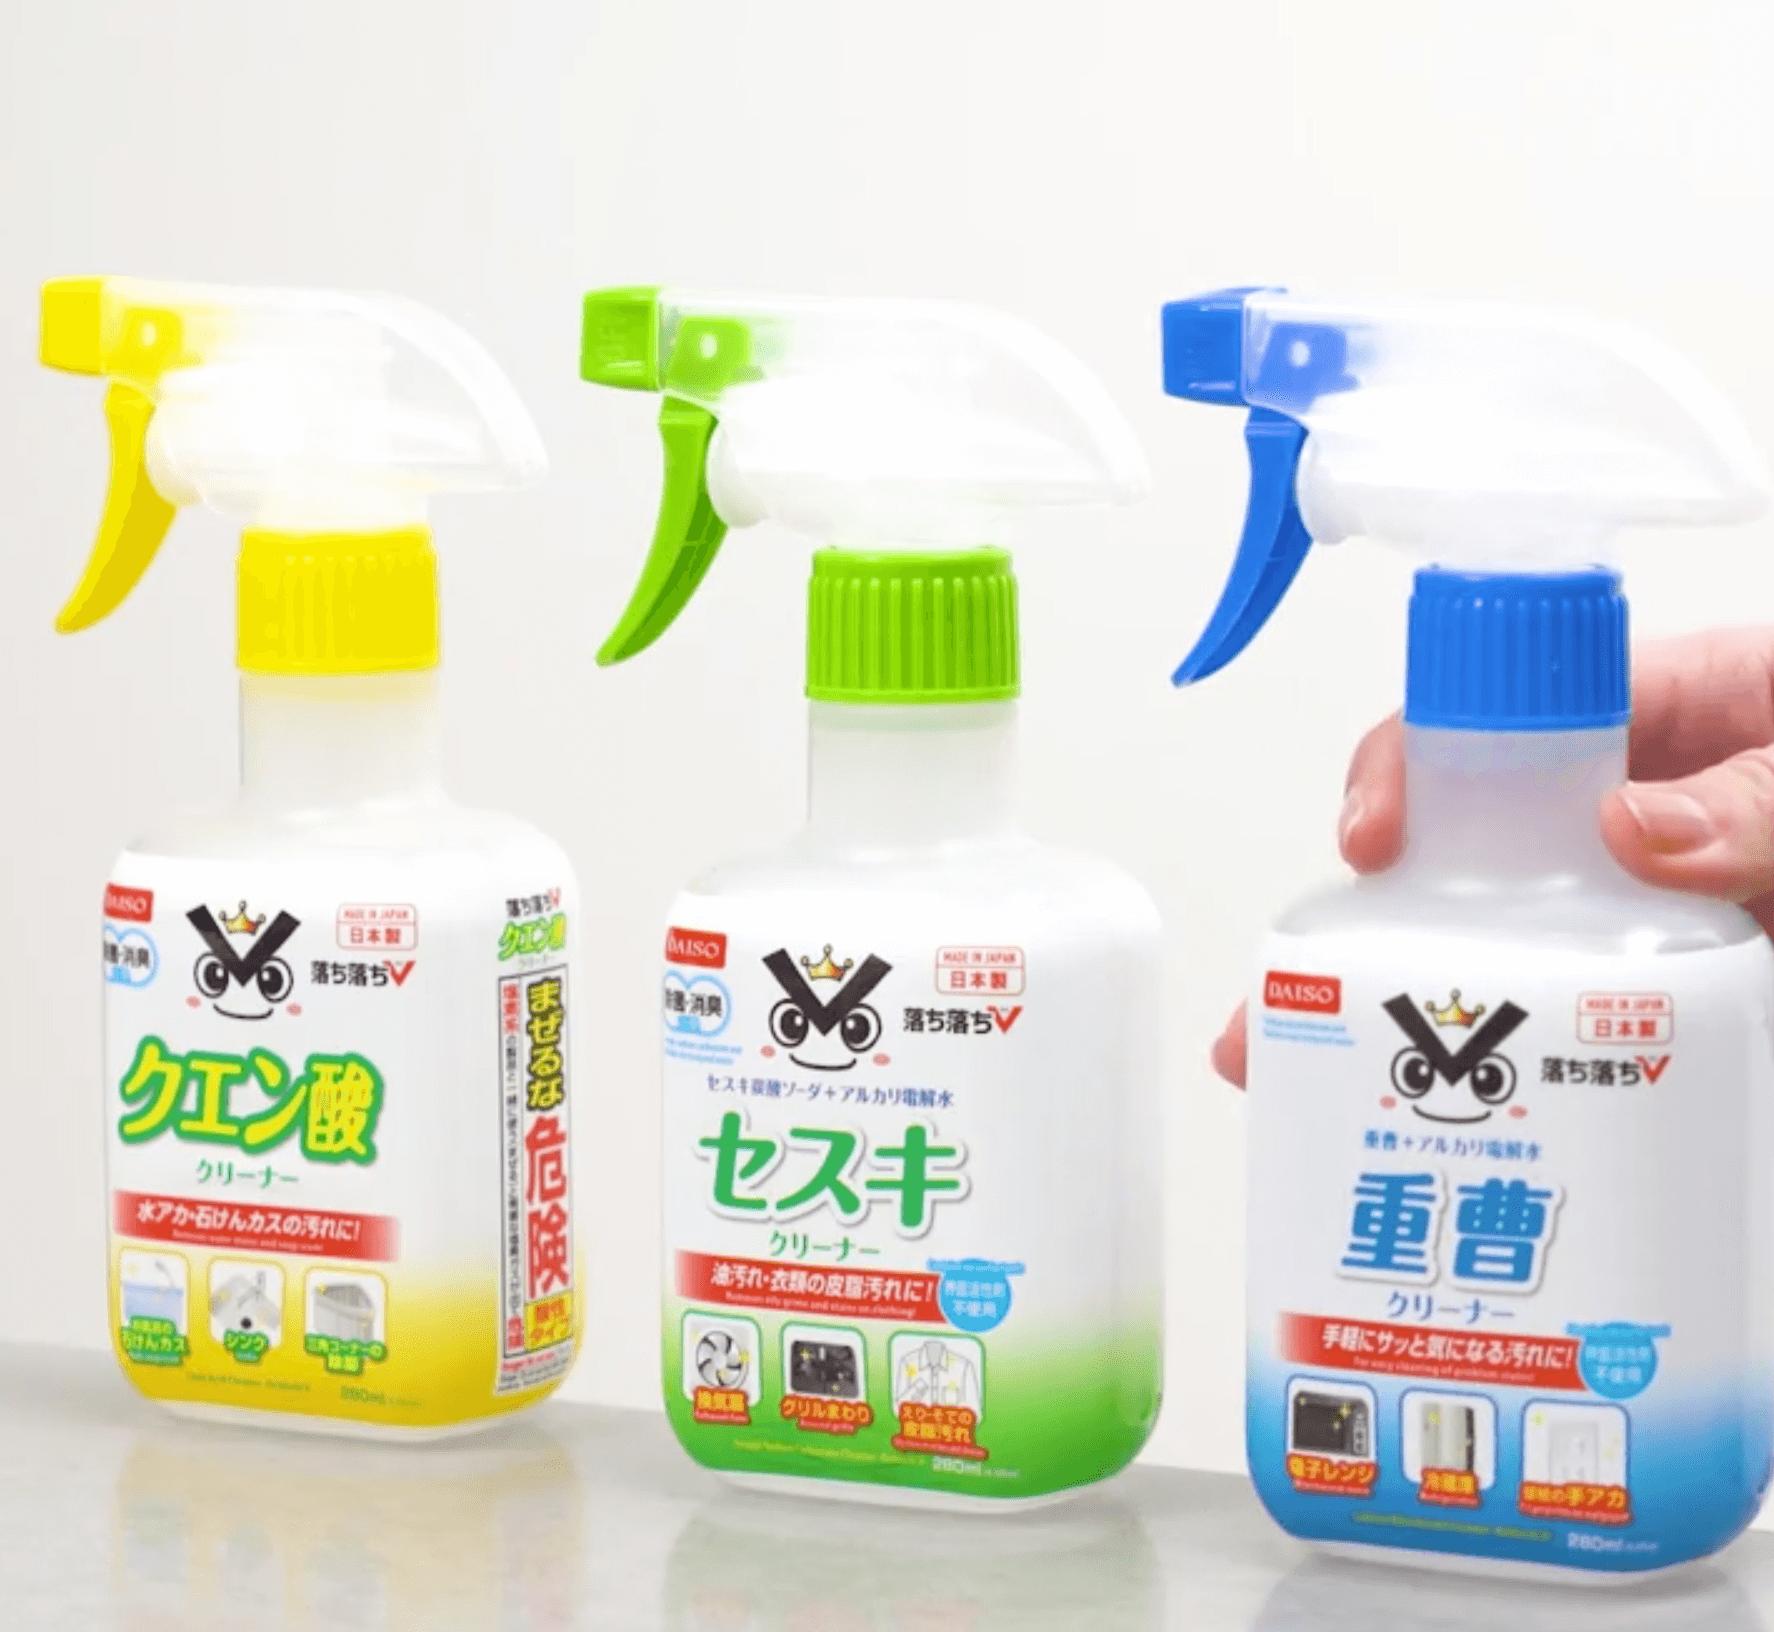 【New Normal Style】おうちの水回り掃除テクニック